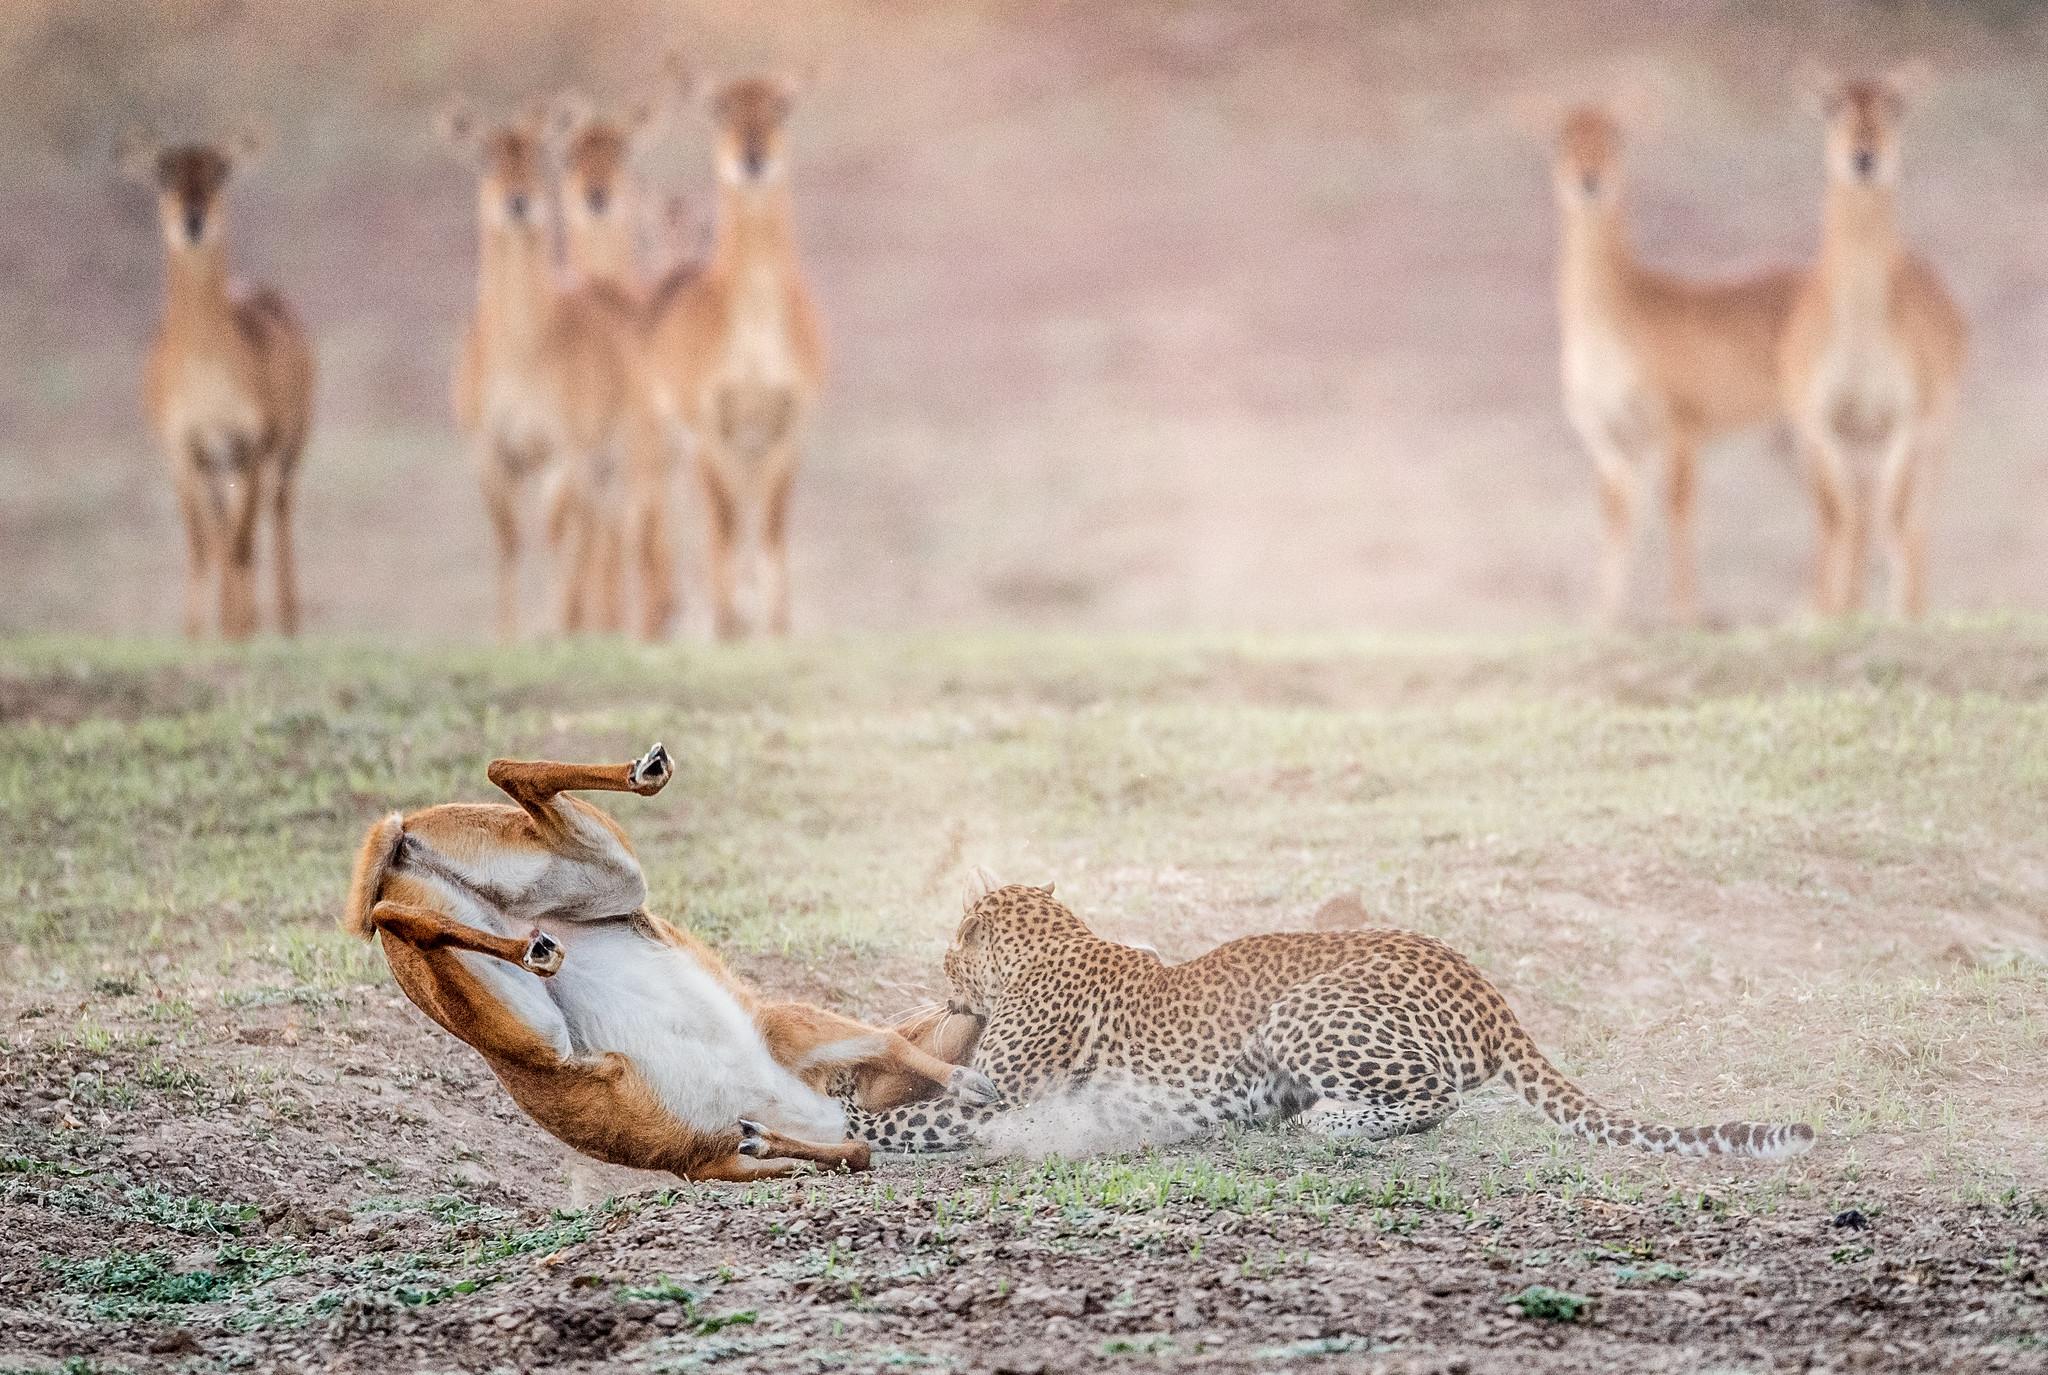 FAREWELL COMRADE - Zambia 2019.jpg